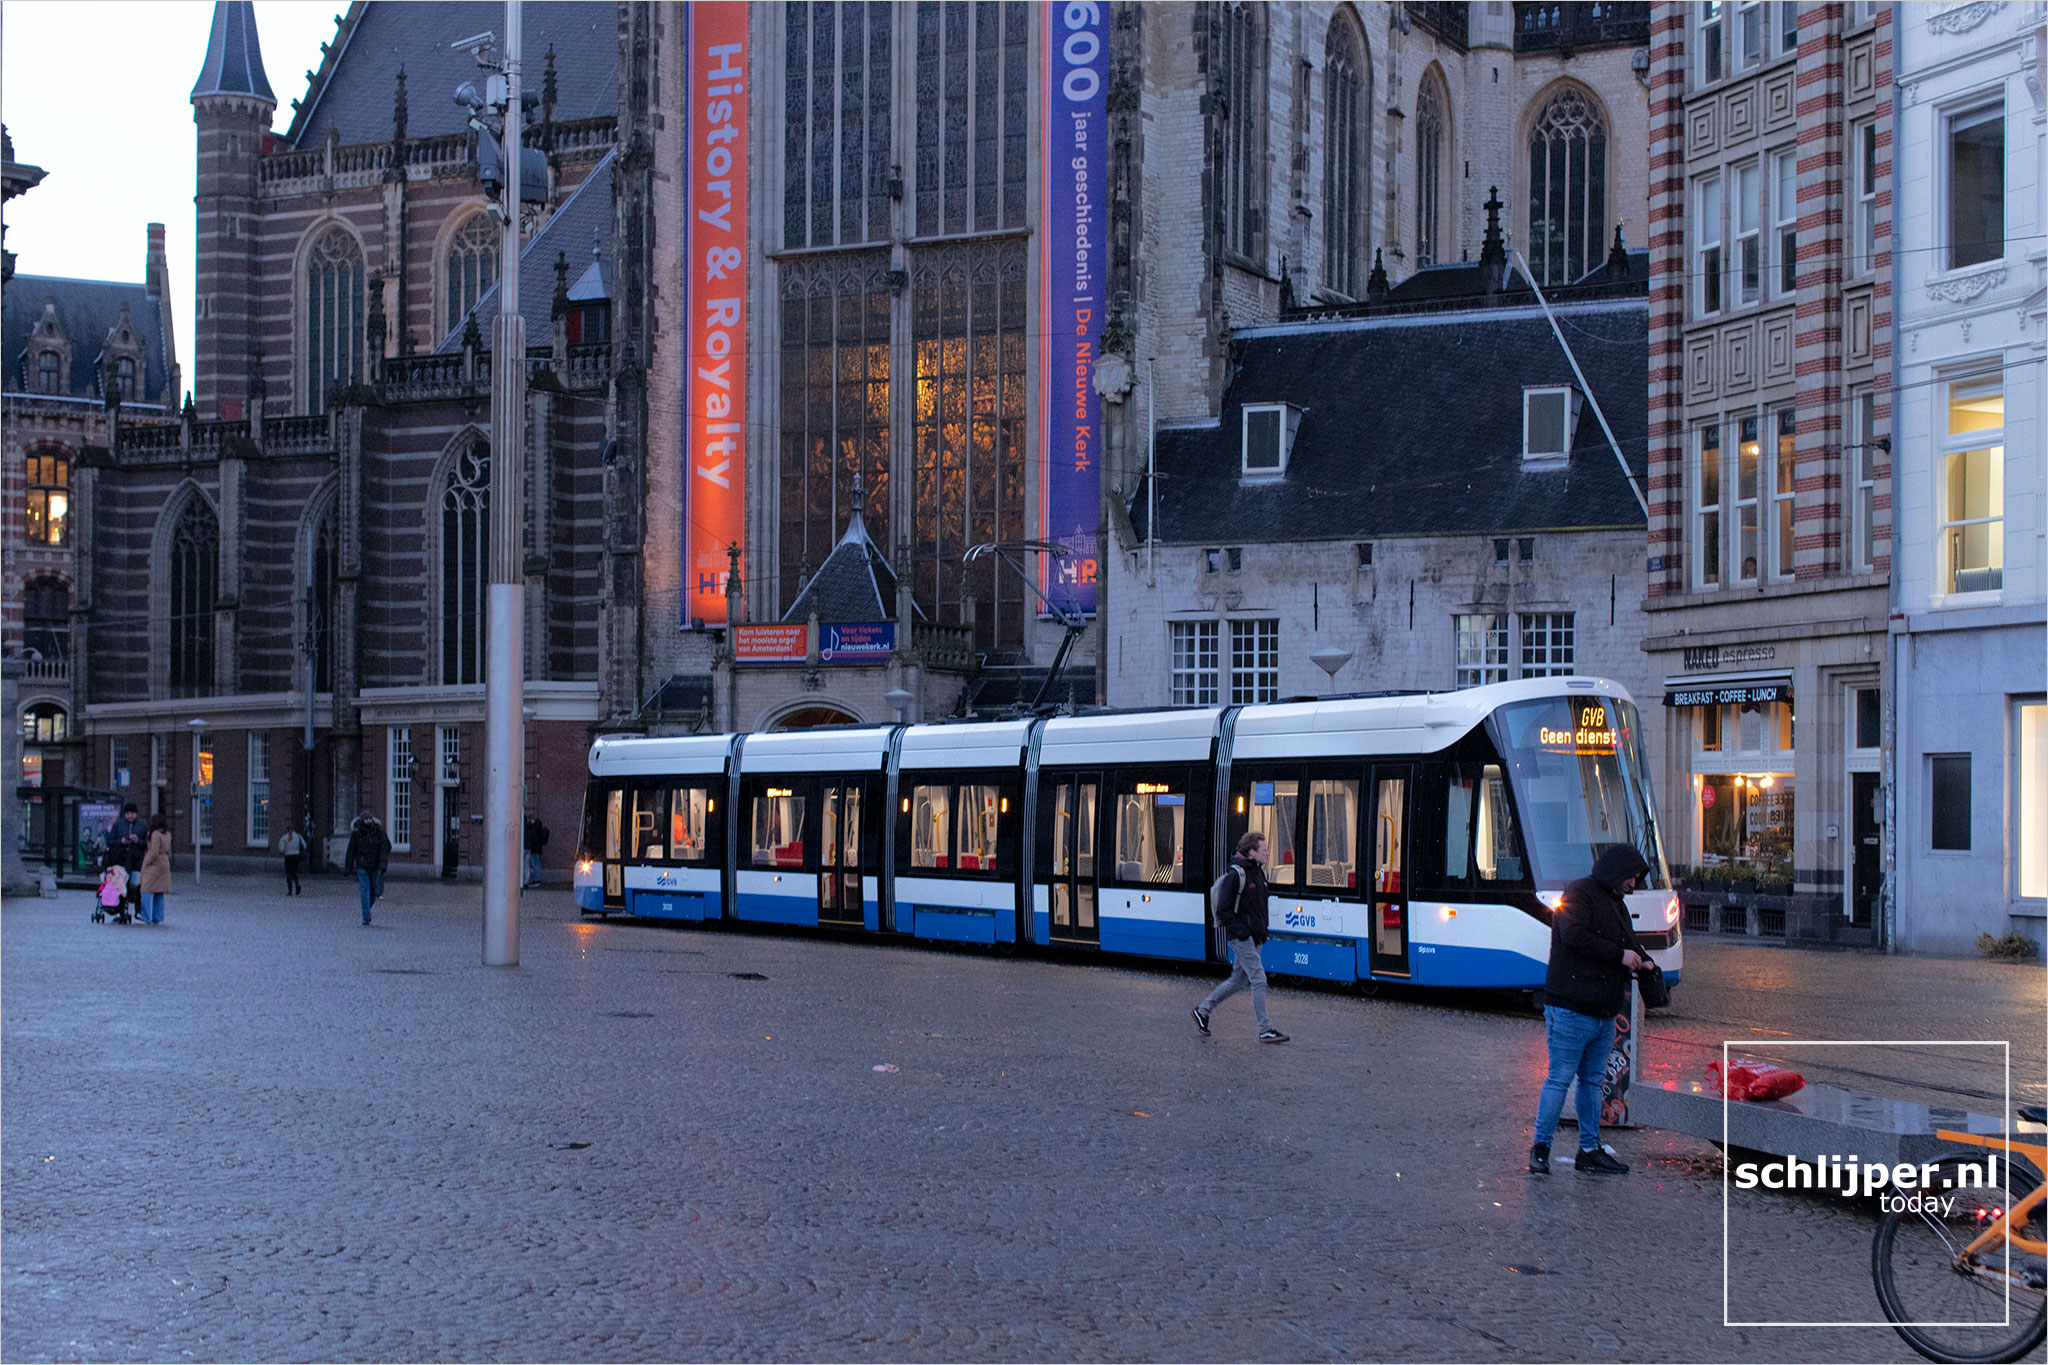 The Netherlands, Amsterdam, 12 januari 2021